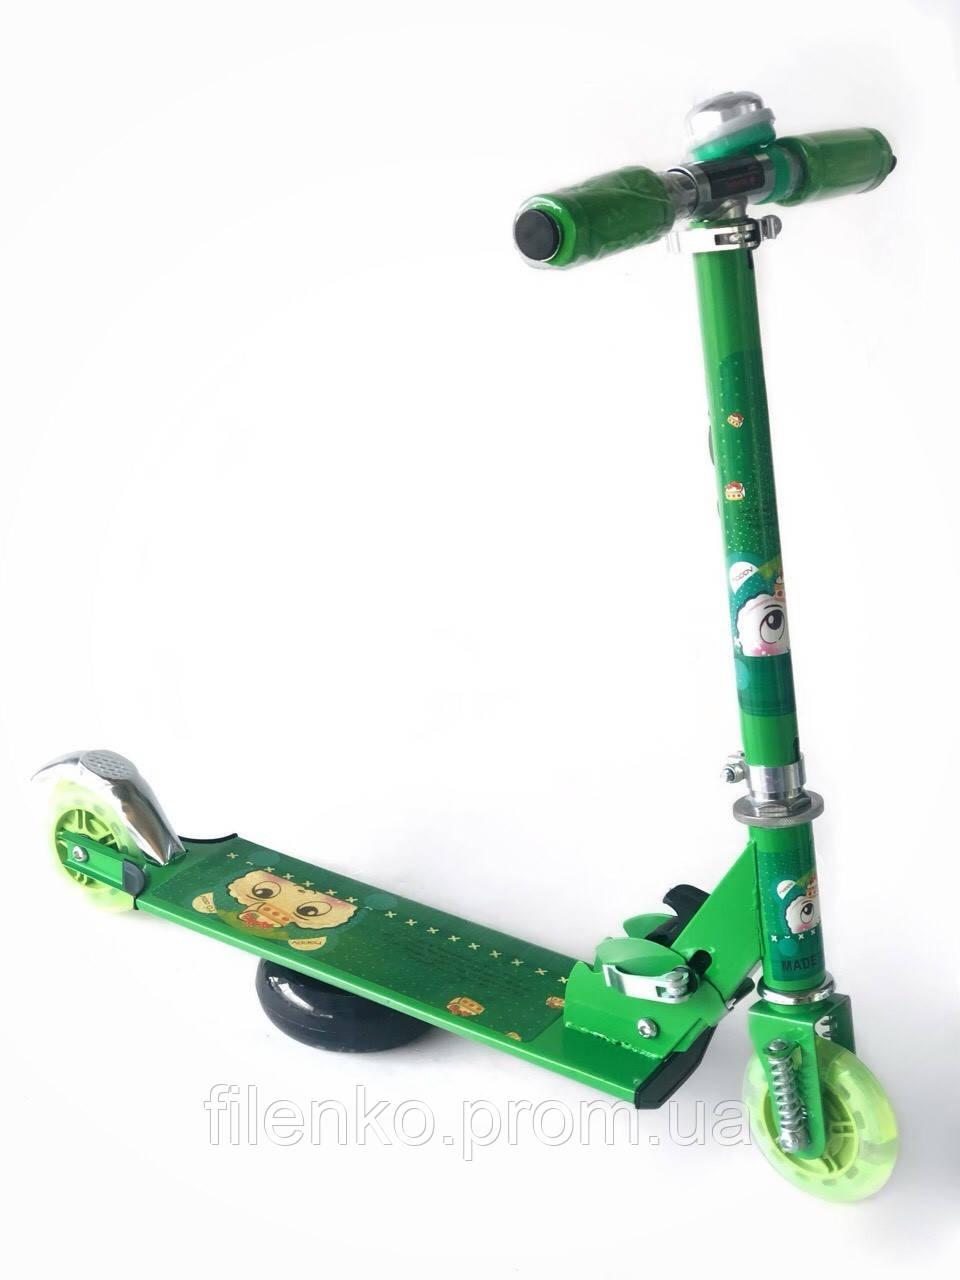 Самокат Scooter Pro 1015 Зеленый